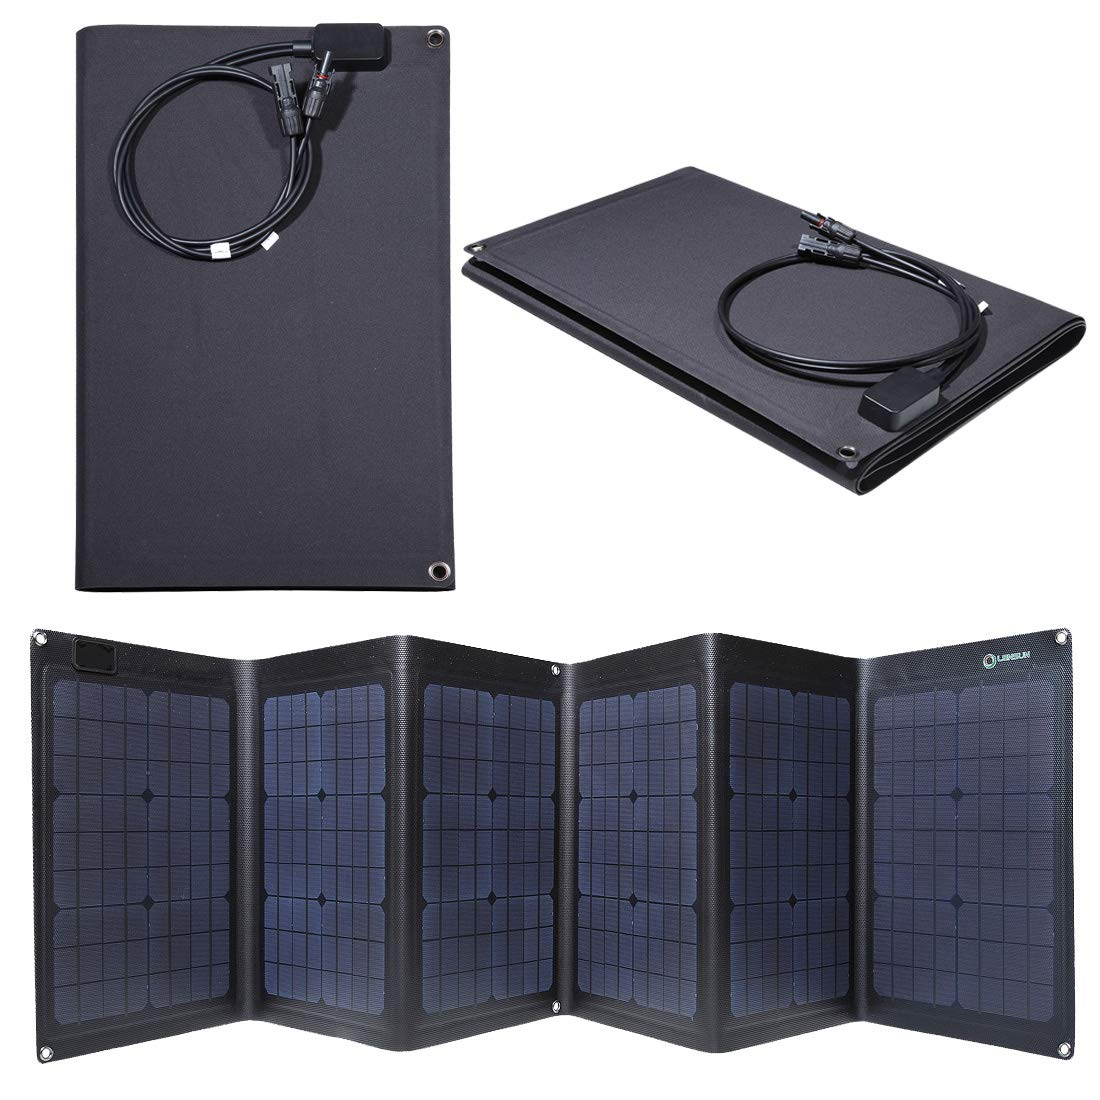 Lensun ETFE Coating 100W 18V Black Portable Folding Solar Charger Panel for 12V Batteries, Completely Waterproof, Best and Thinnest Foldable Solar Panel